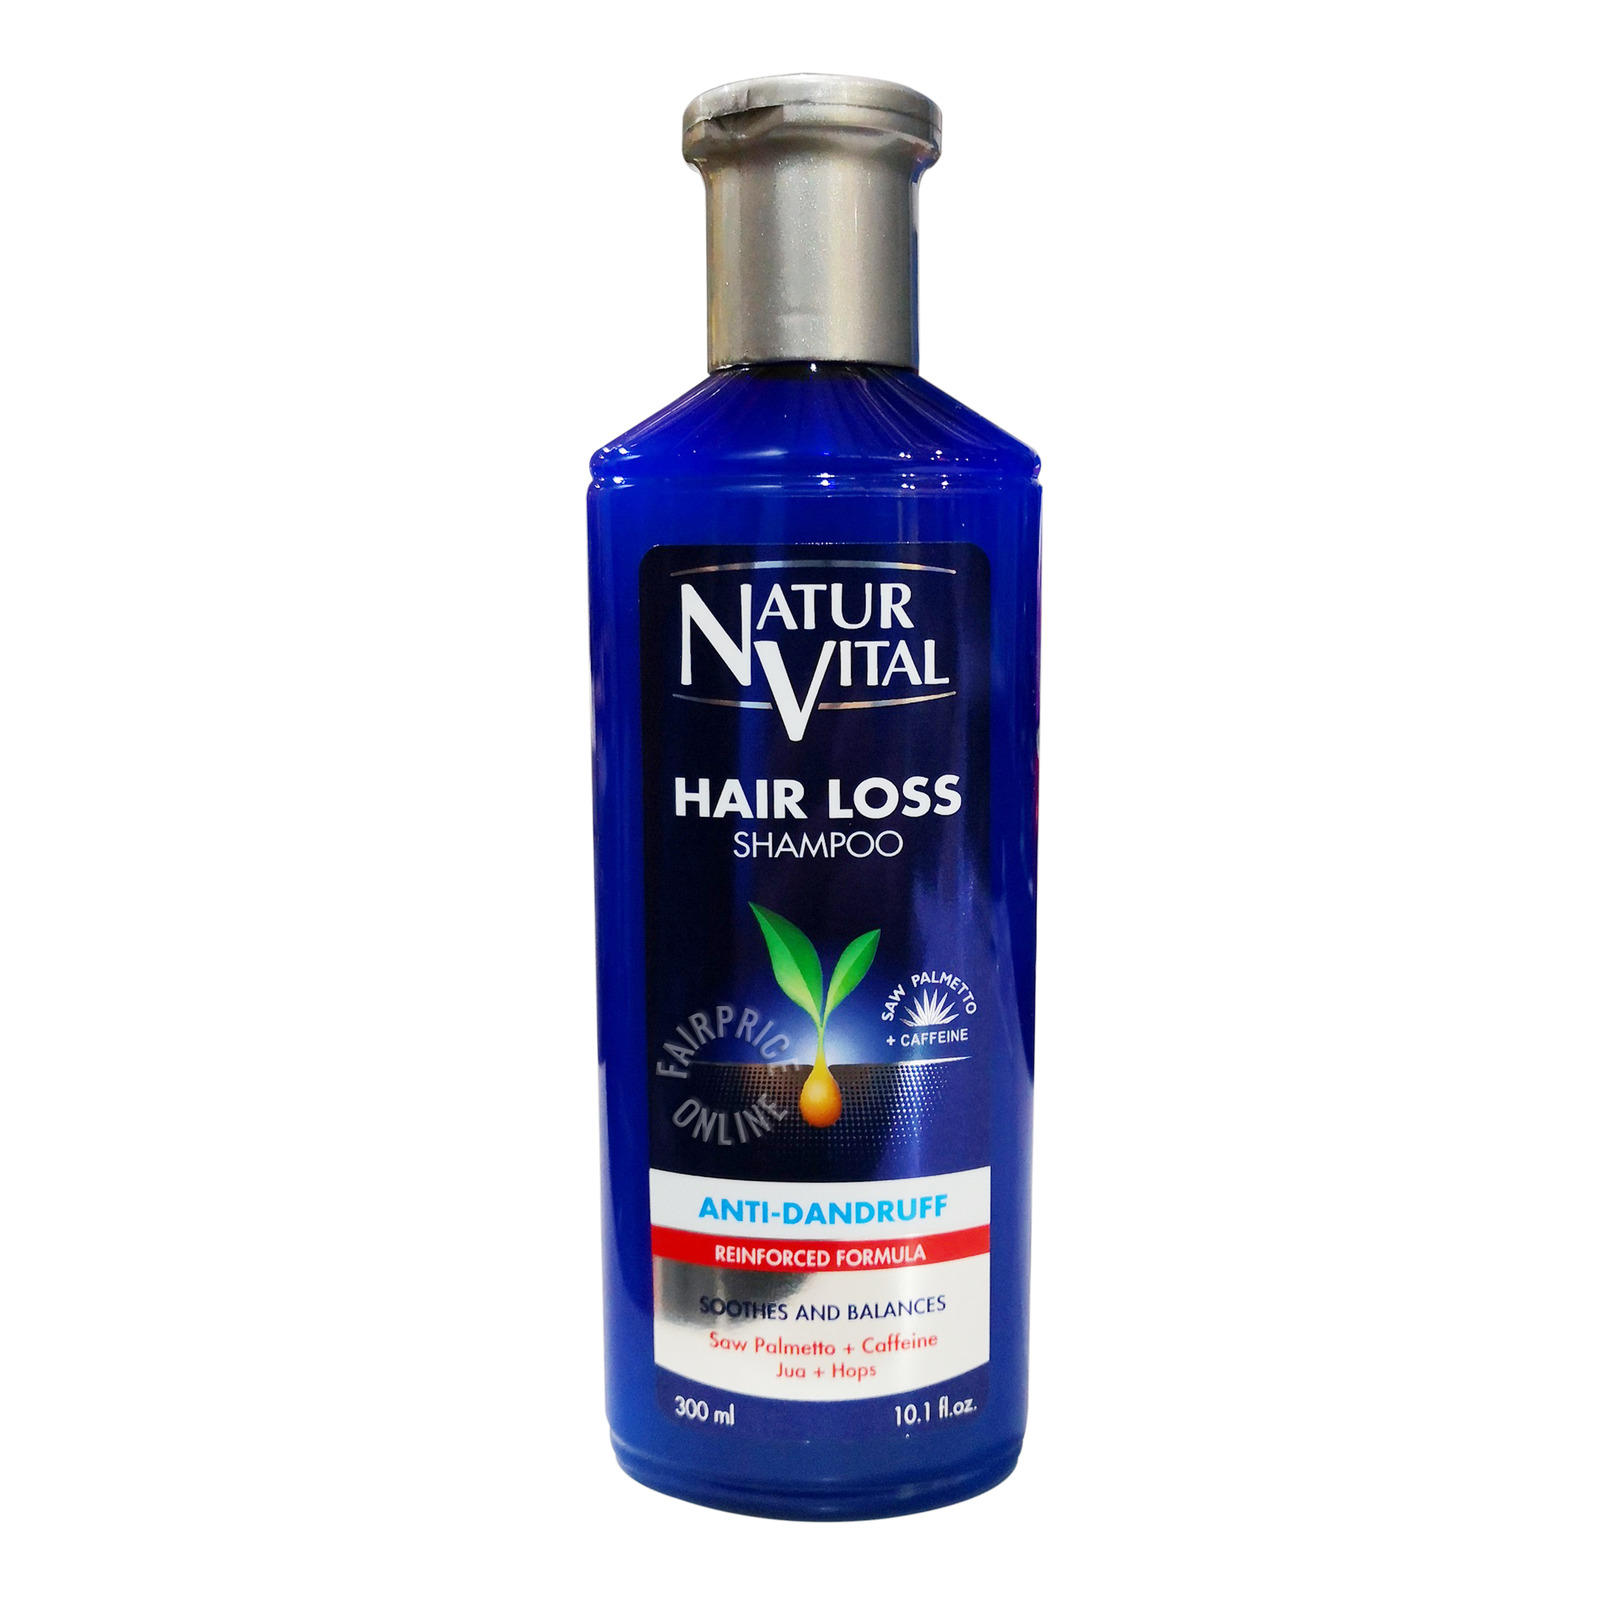 NATURVITAL anti dandruff shampoo normal hair 300ml